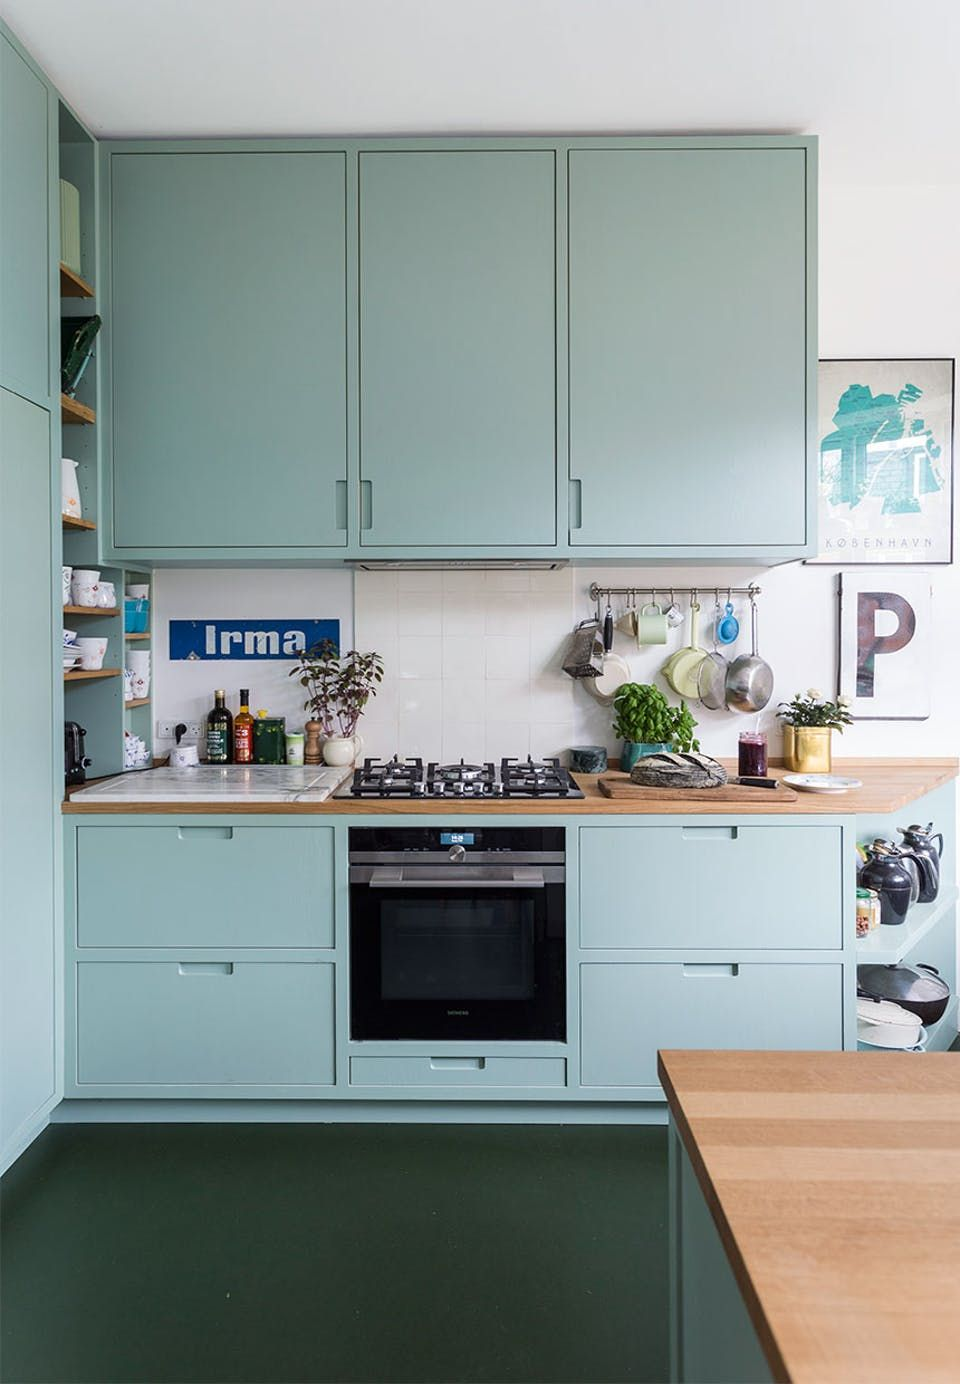 Green Color Palette Reigns In This Copenhagen Home  Green Colour Gorgeous Kitchen Cabinets Color Combination Design Ideas